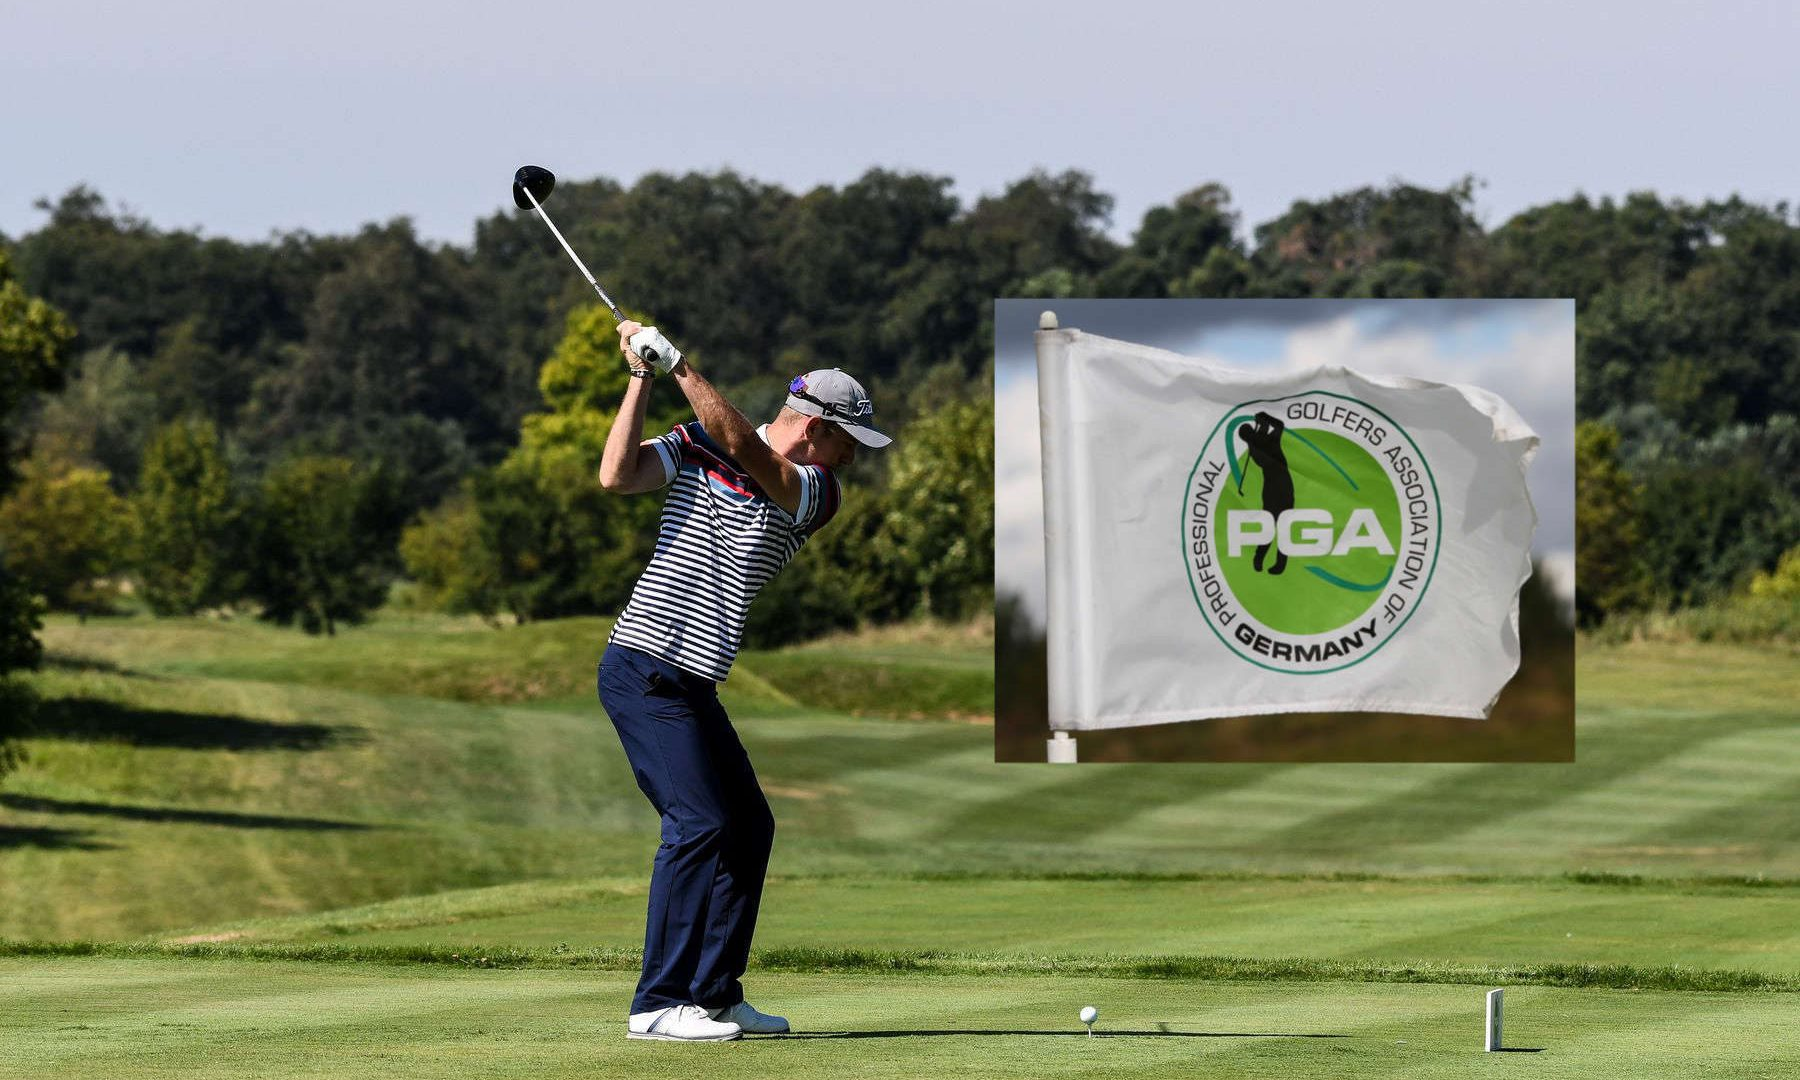 PGA of Germany – Neuer PGA Professional und Lehrgangsbester: Maximilian Röhrig